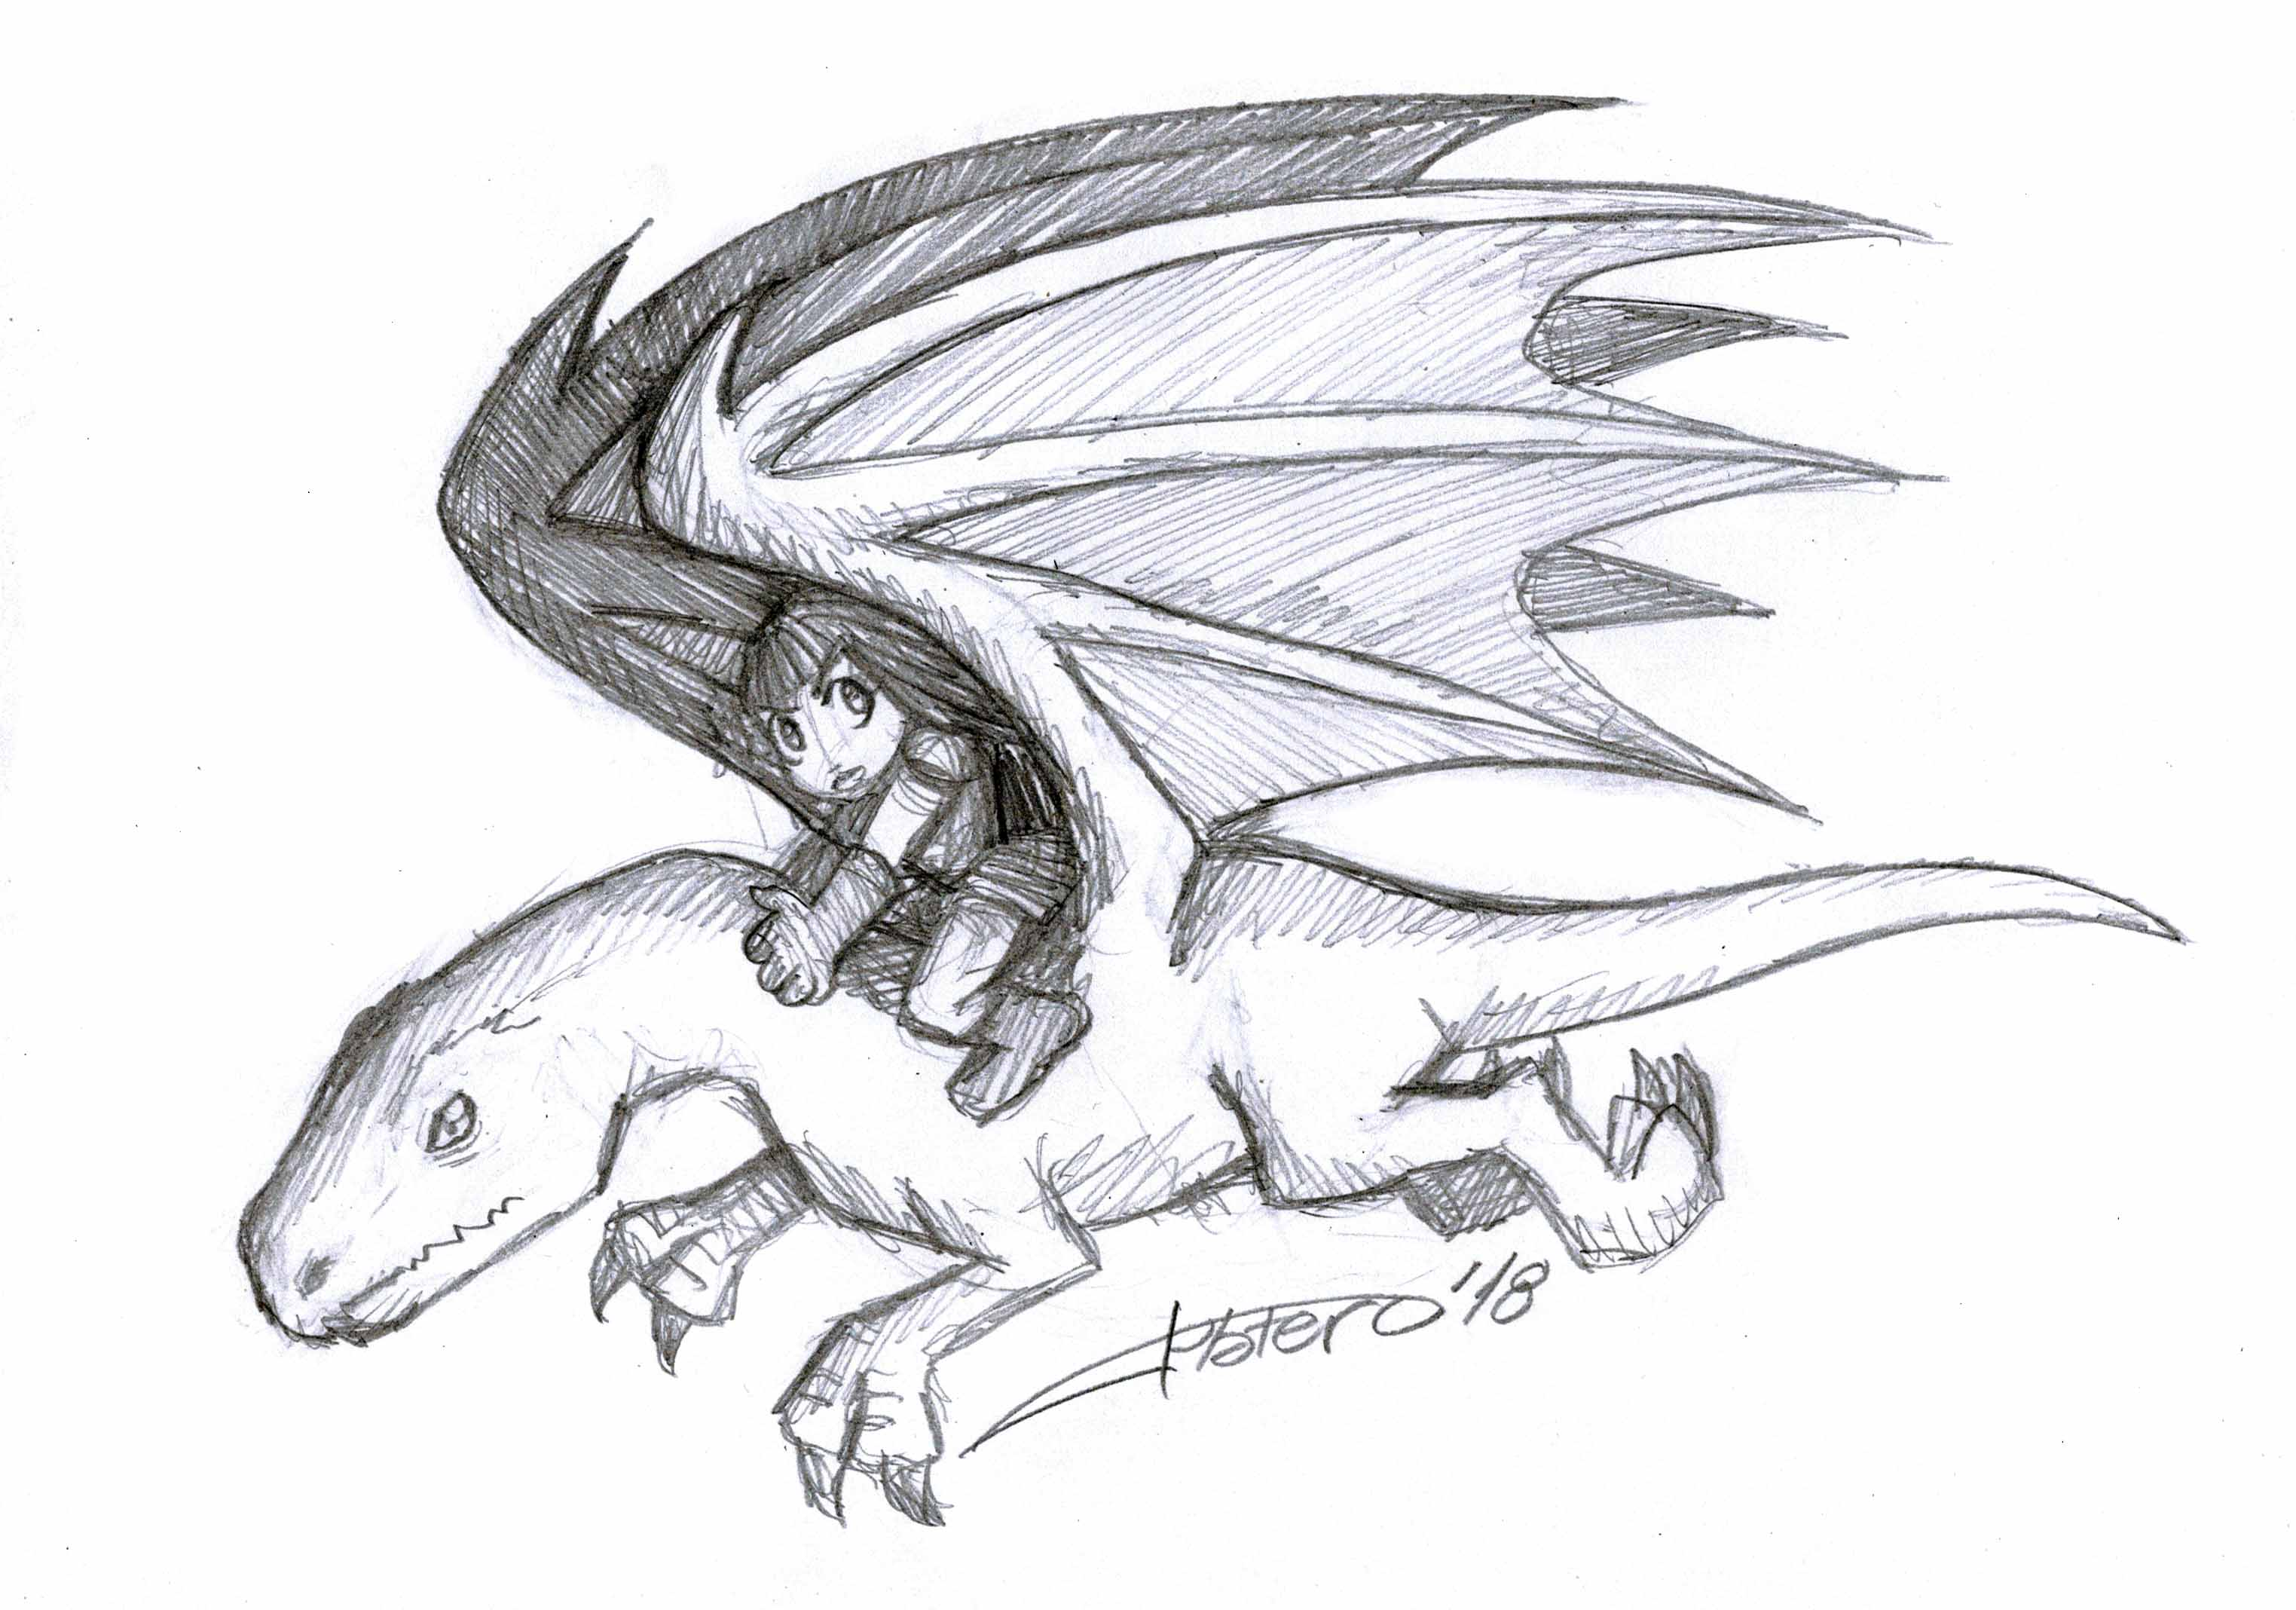 guerrerilla sobre dragon